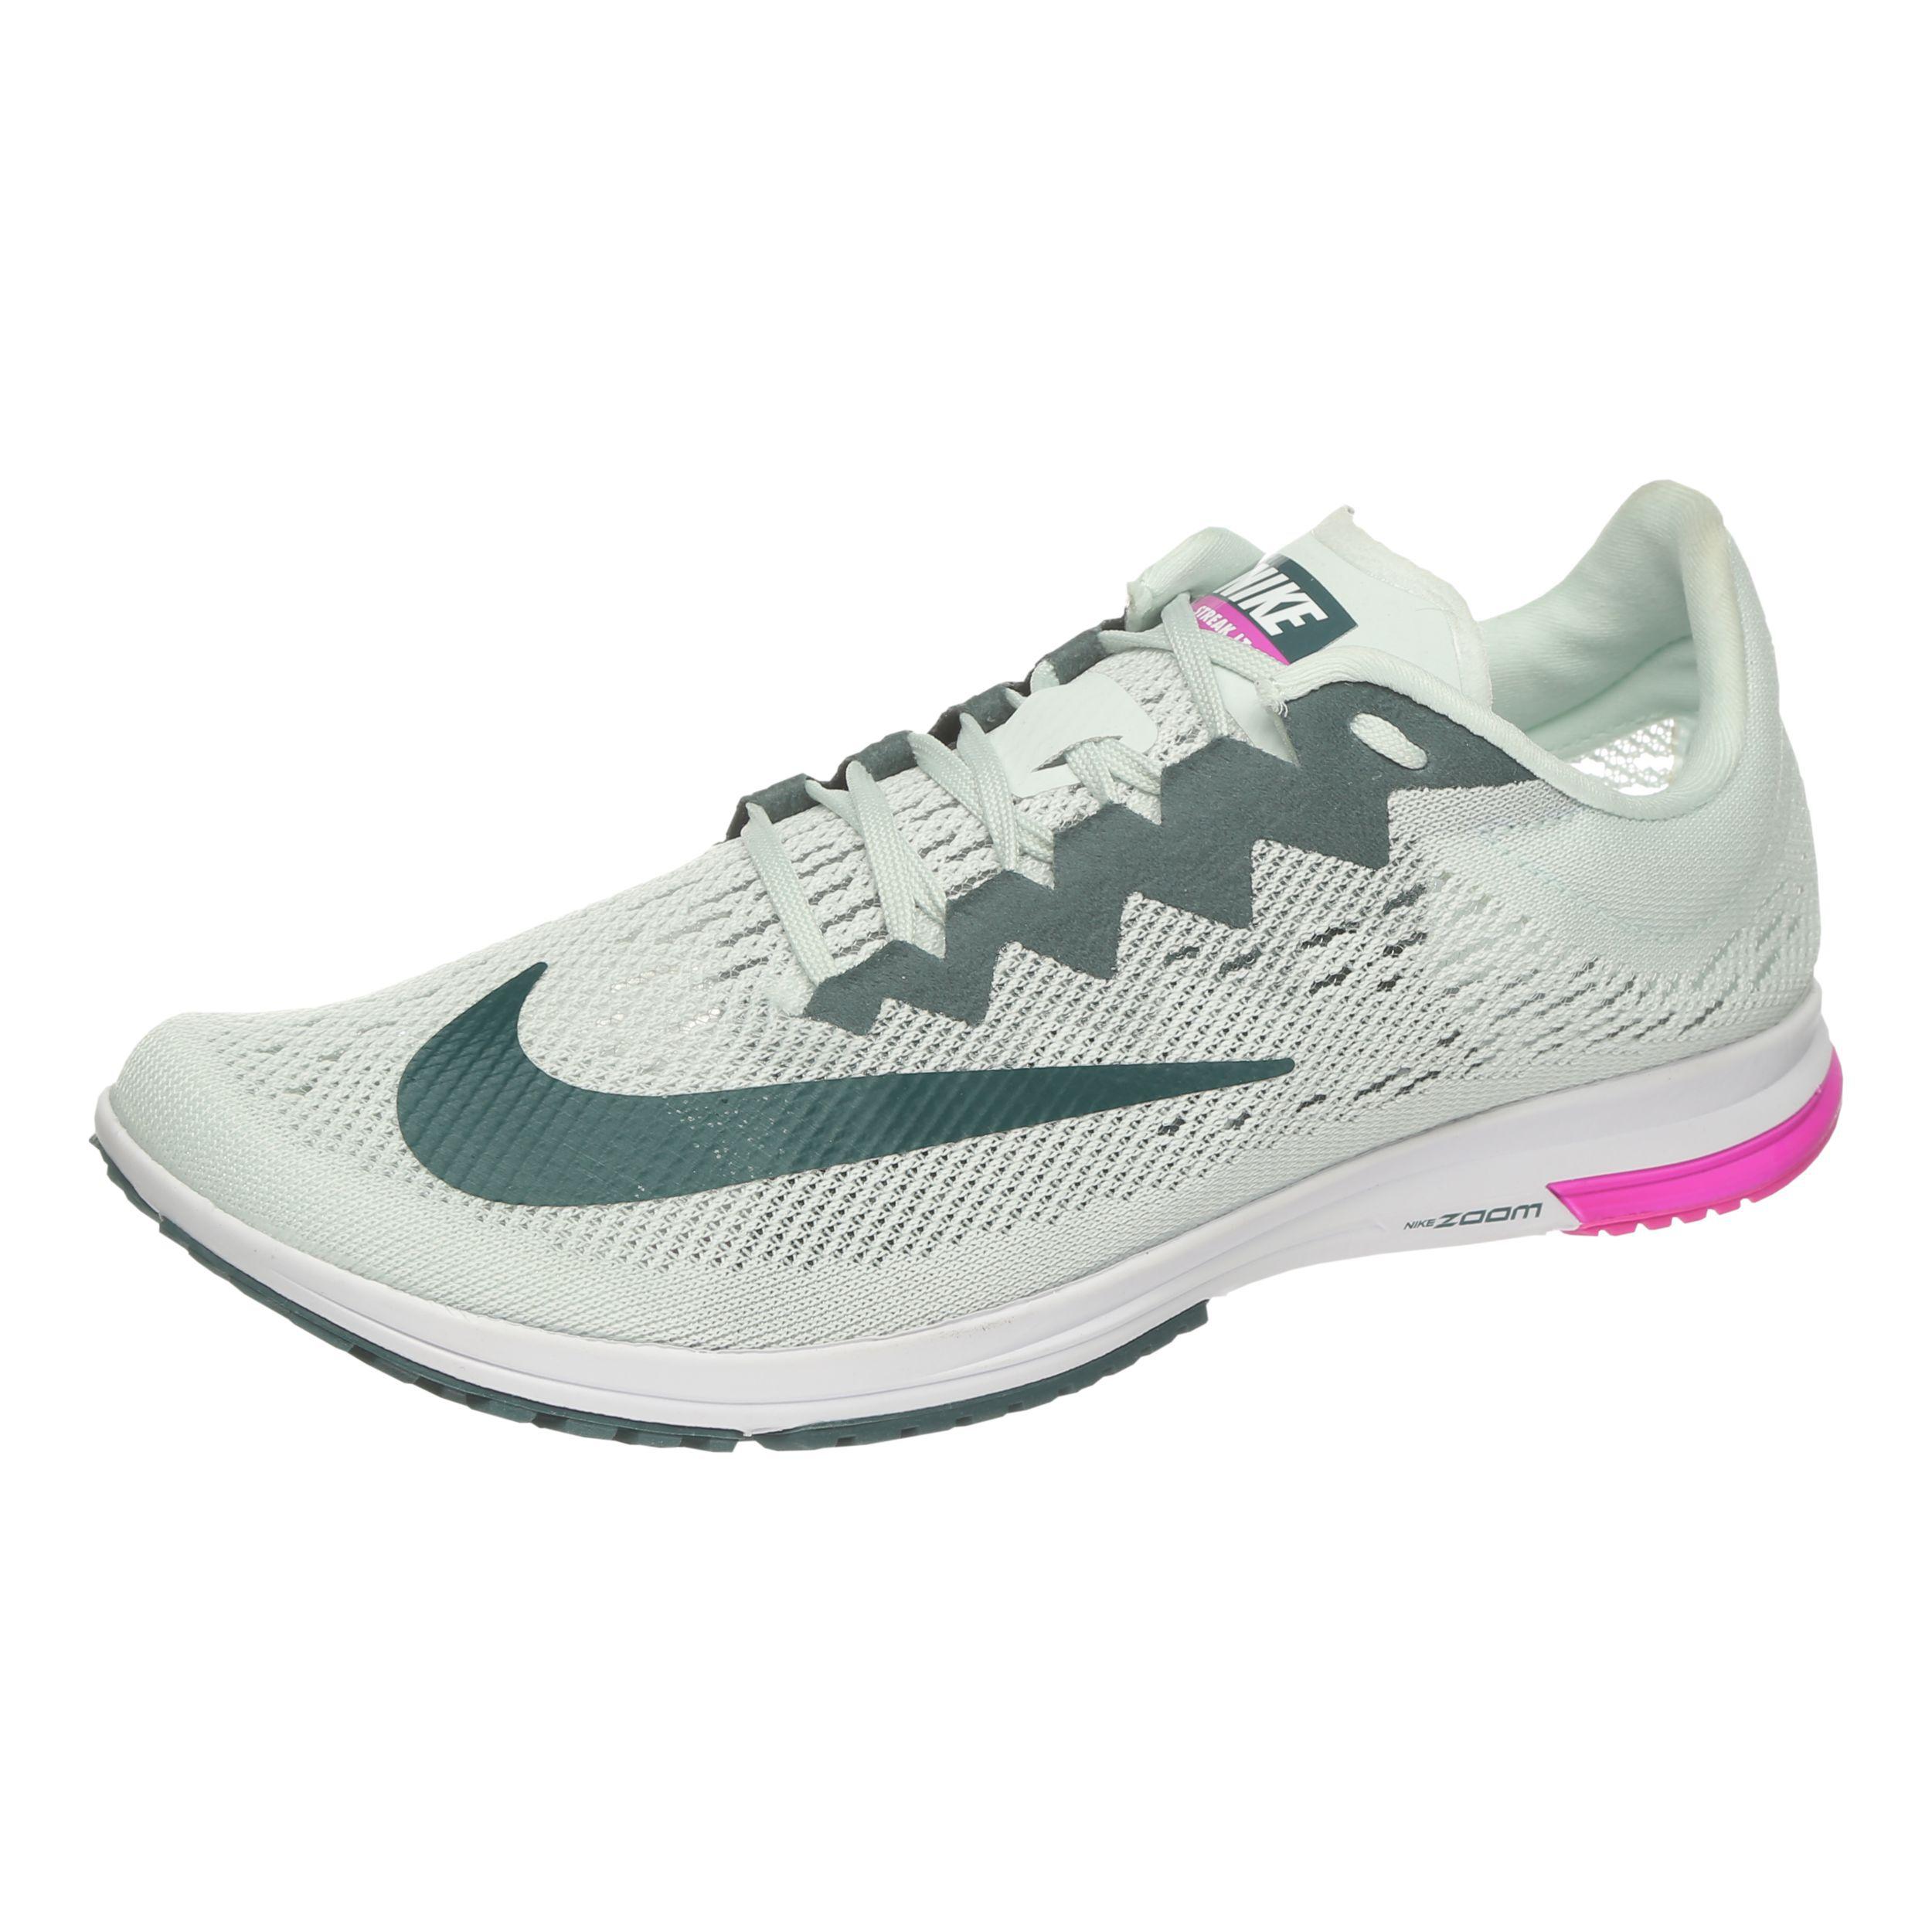 buy Nike Zoom Streak LT 4 Spike Shoes